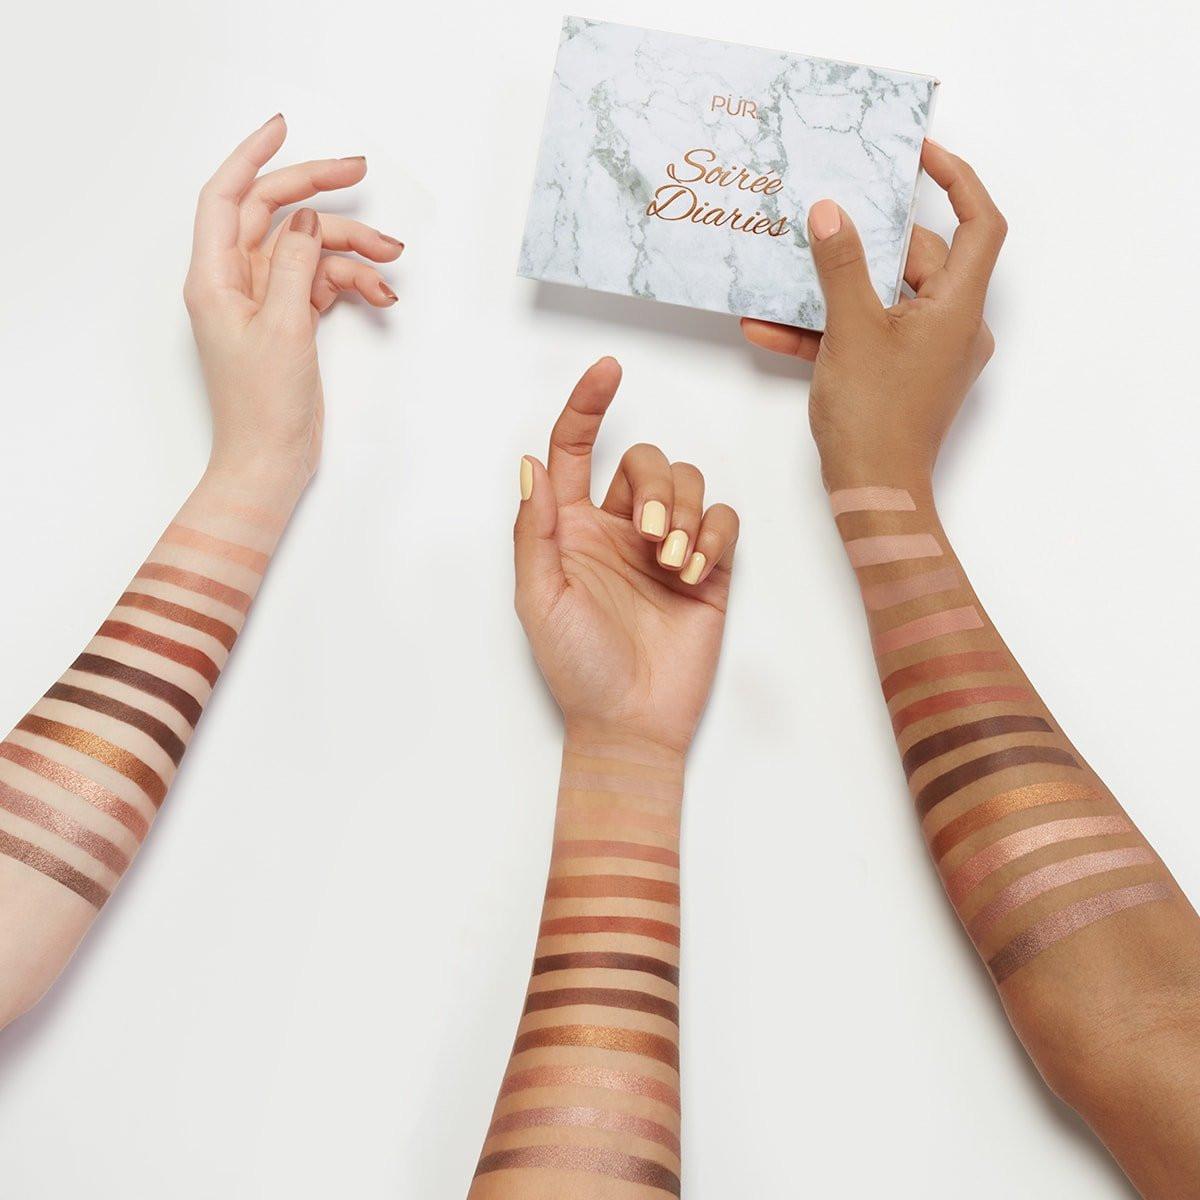 Pür Cosmetics eyeshadow Soirée Diaries palettes